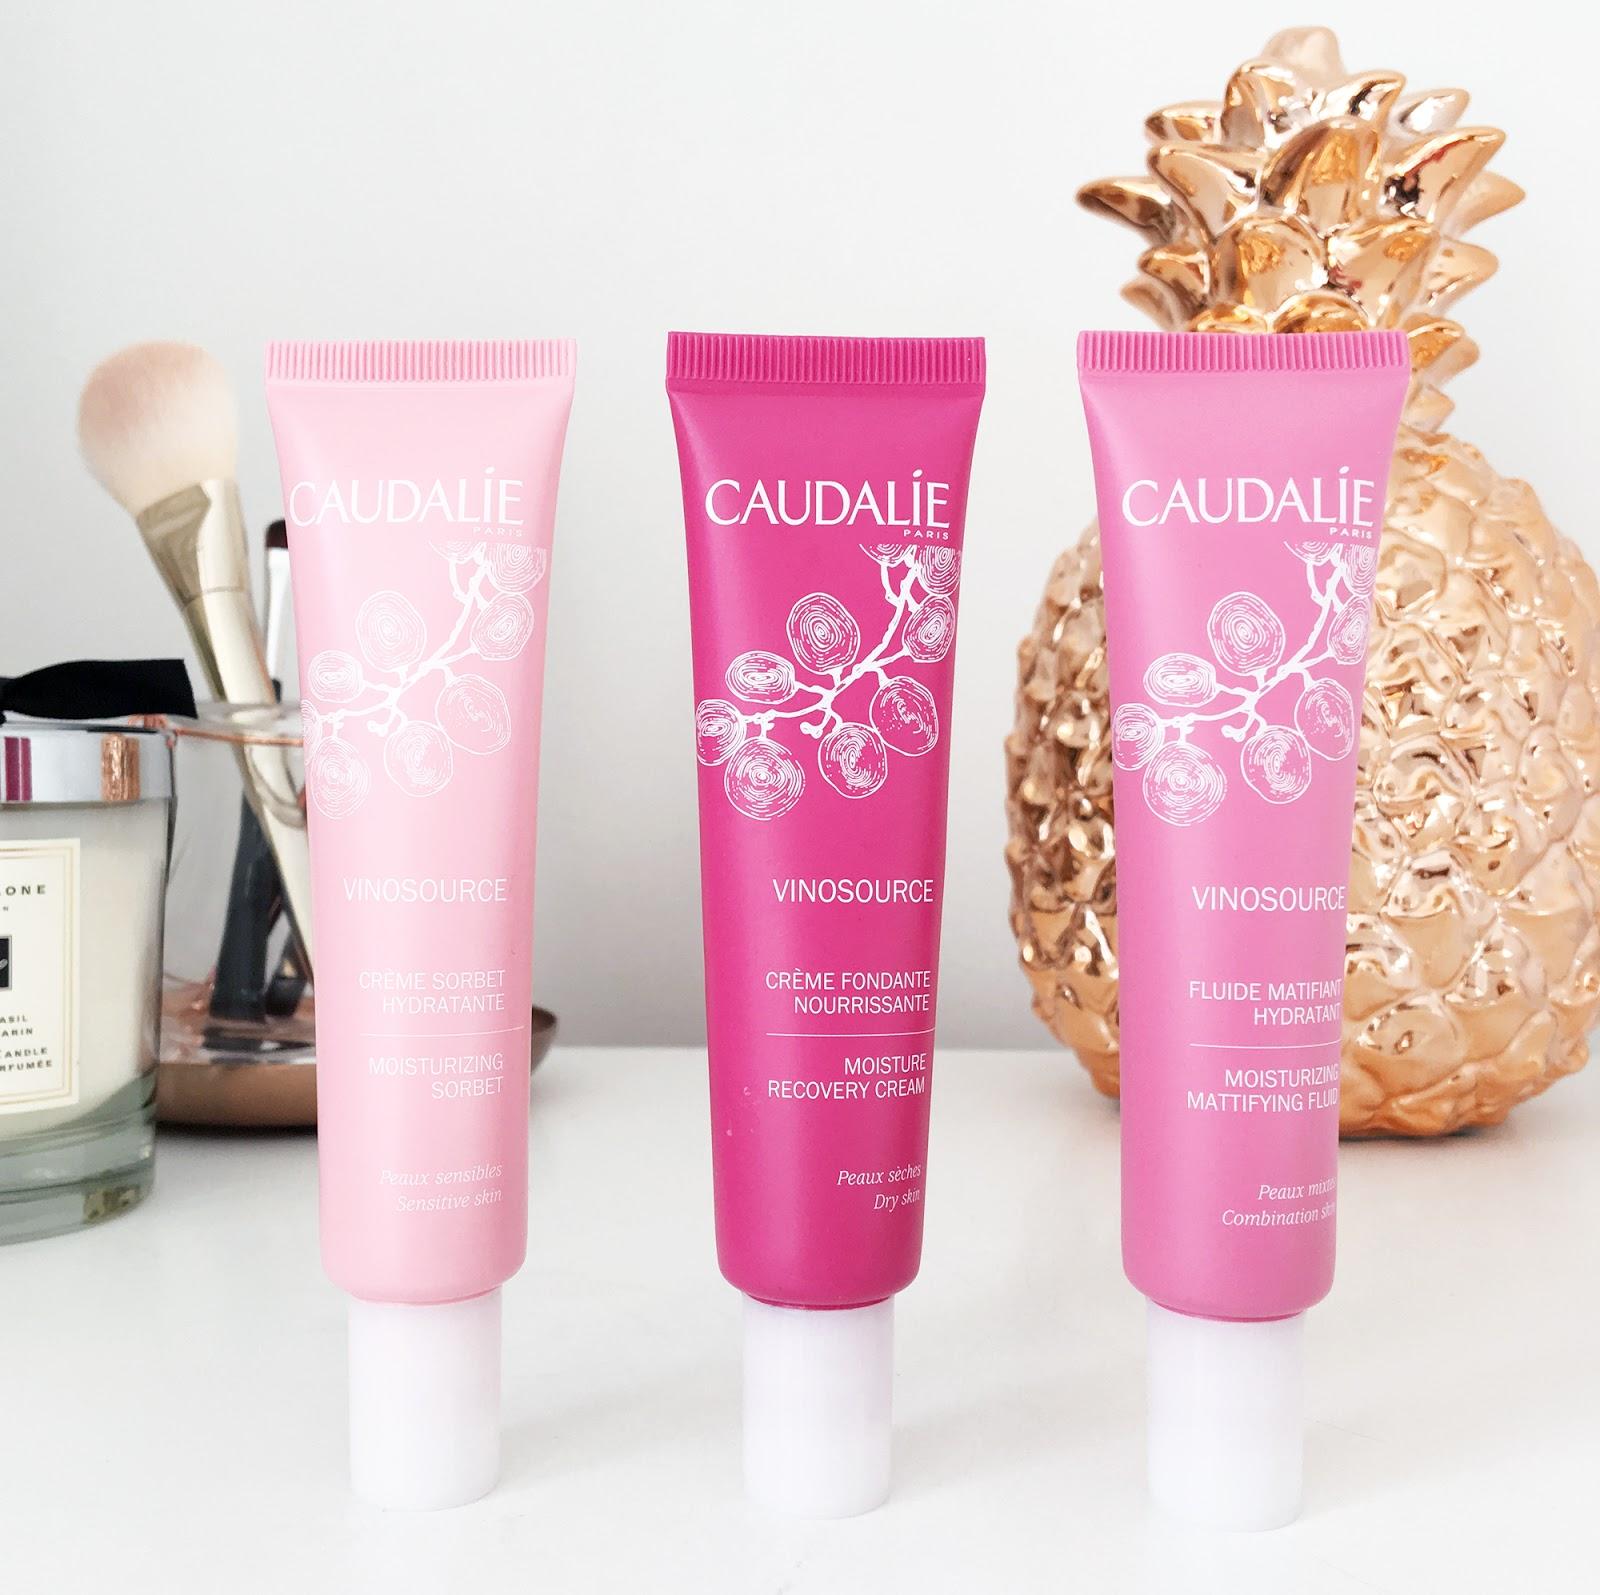 Caudalie Vinosource moisturisers review